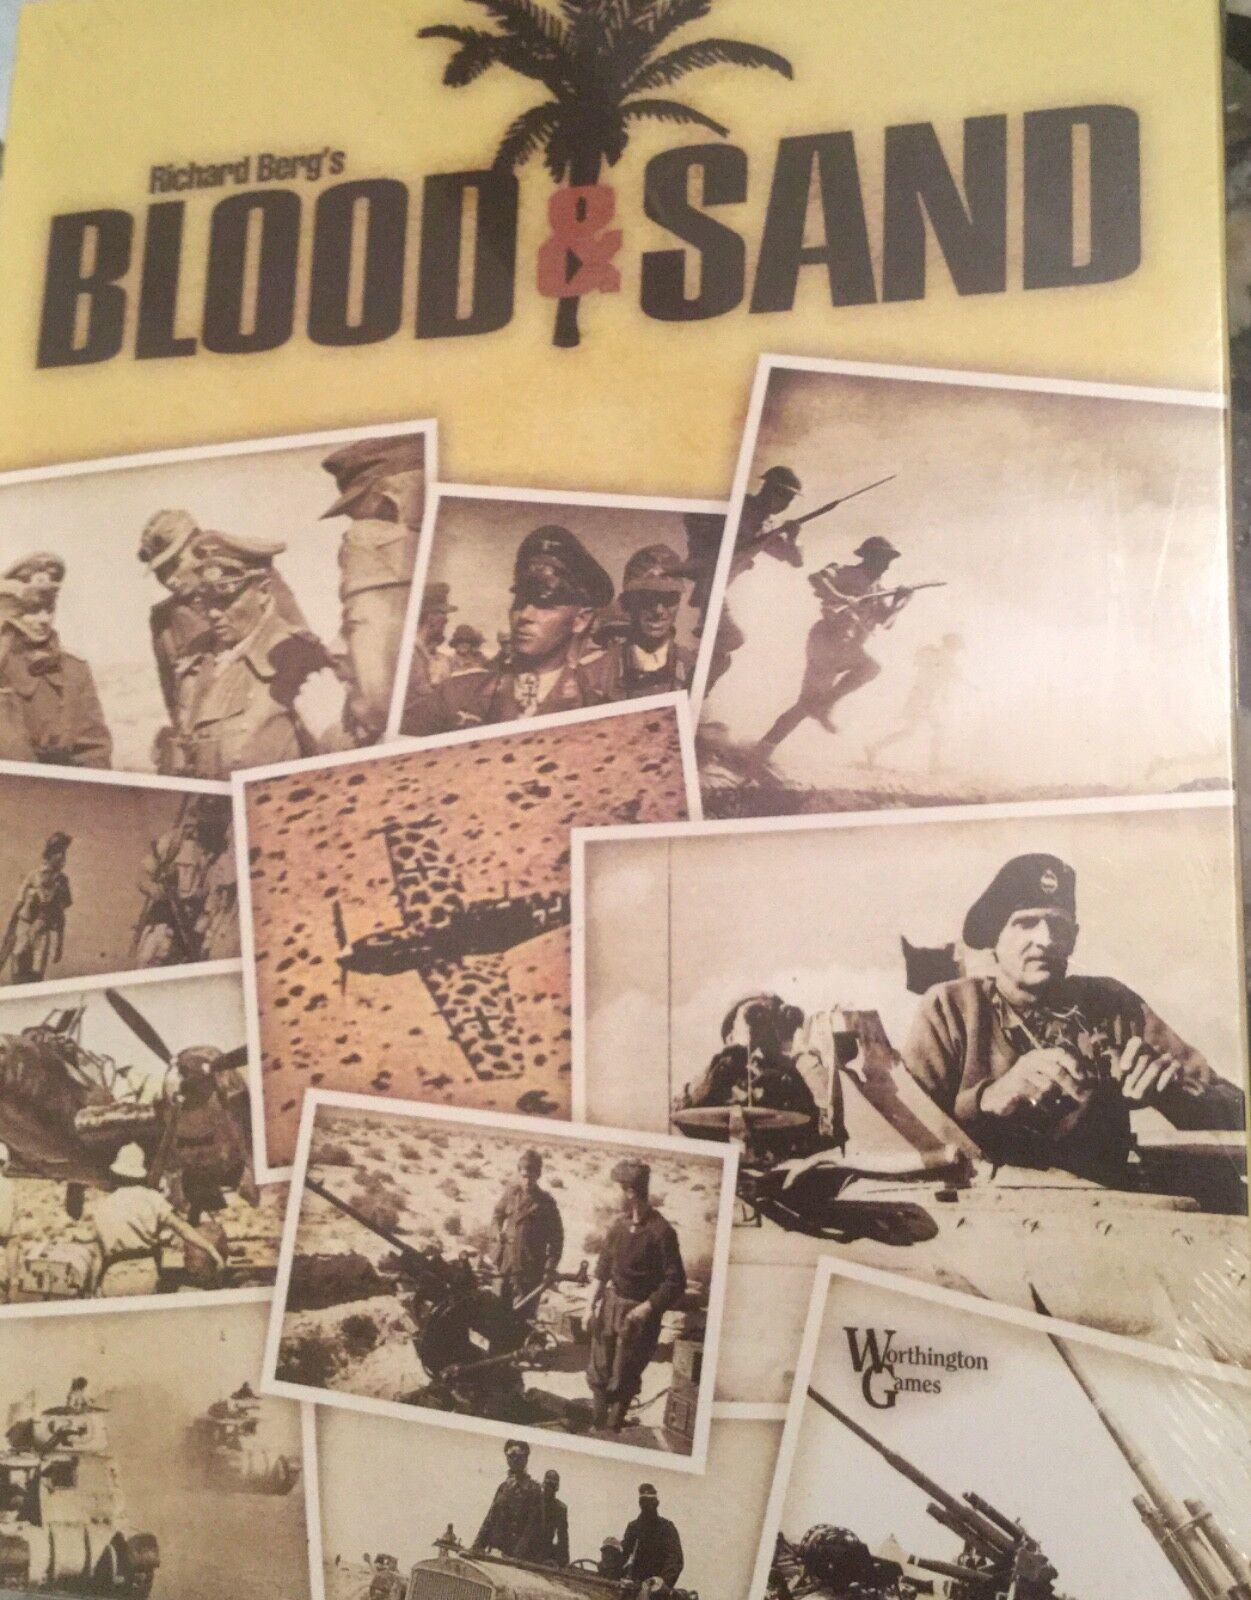 Blood & Se, by Worthington; Vol  2 of Bitter Victory gioco series; SW  promozioni di sconto